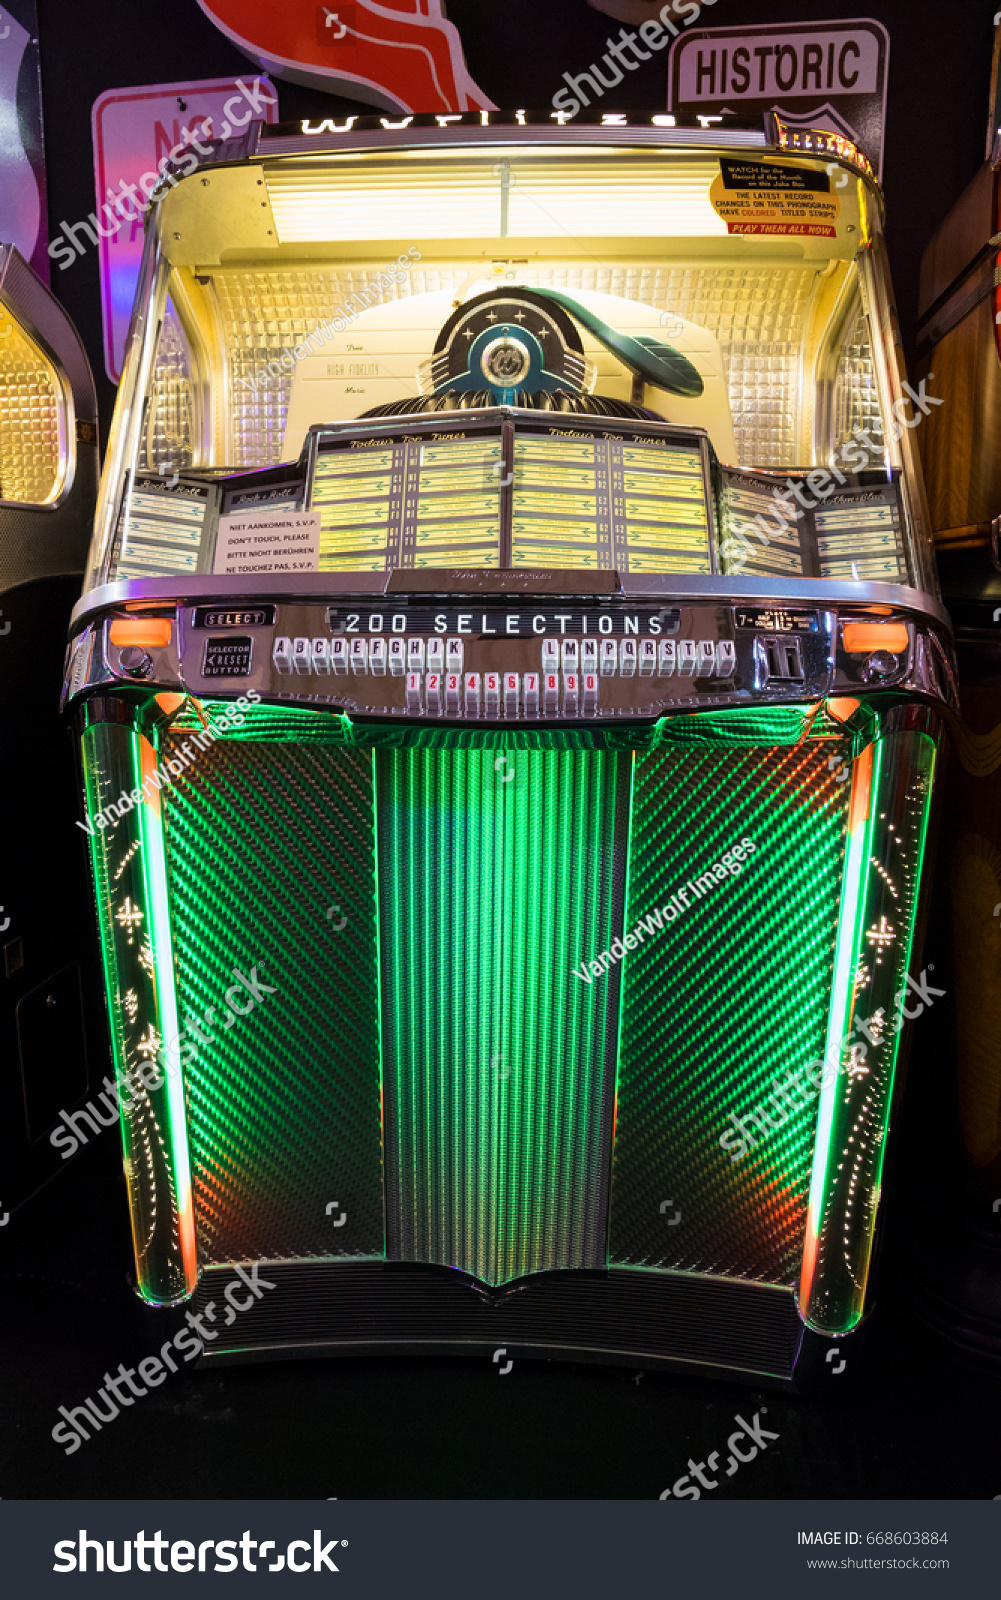 ESSEN, GERMANY - APR 6, 2017: Vintage Wurlitzer 2000 Centennial music  jukebox for sale at the Techno Classica Essen event. - Image